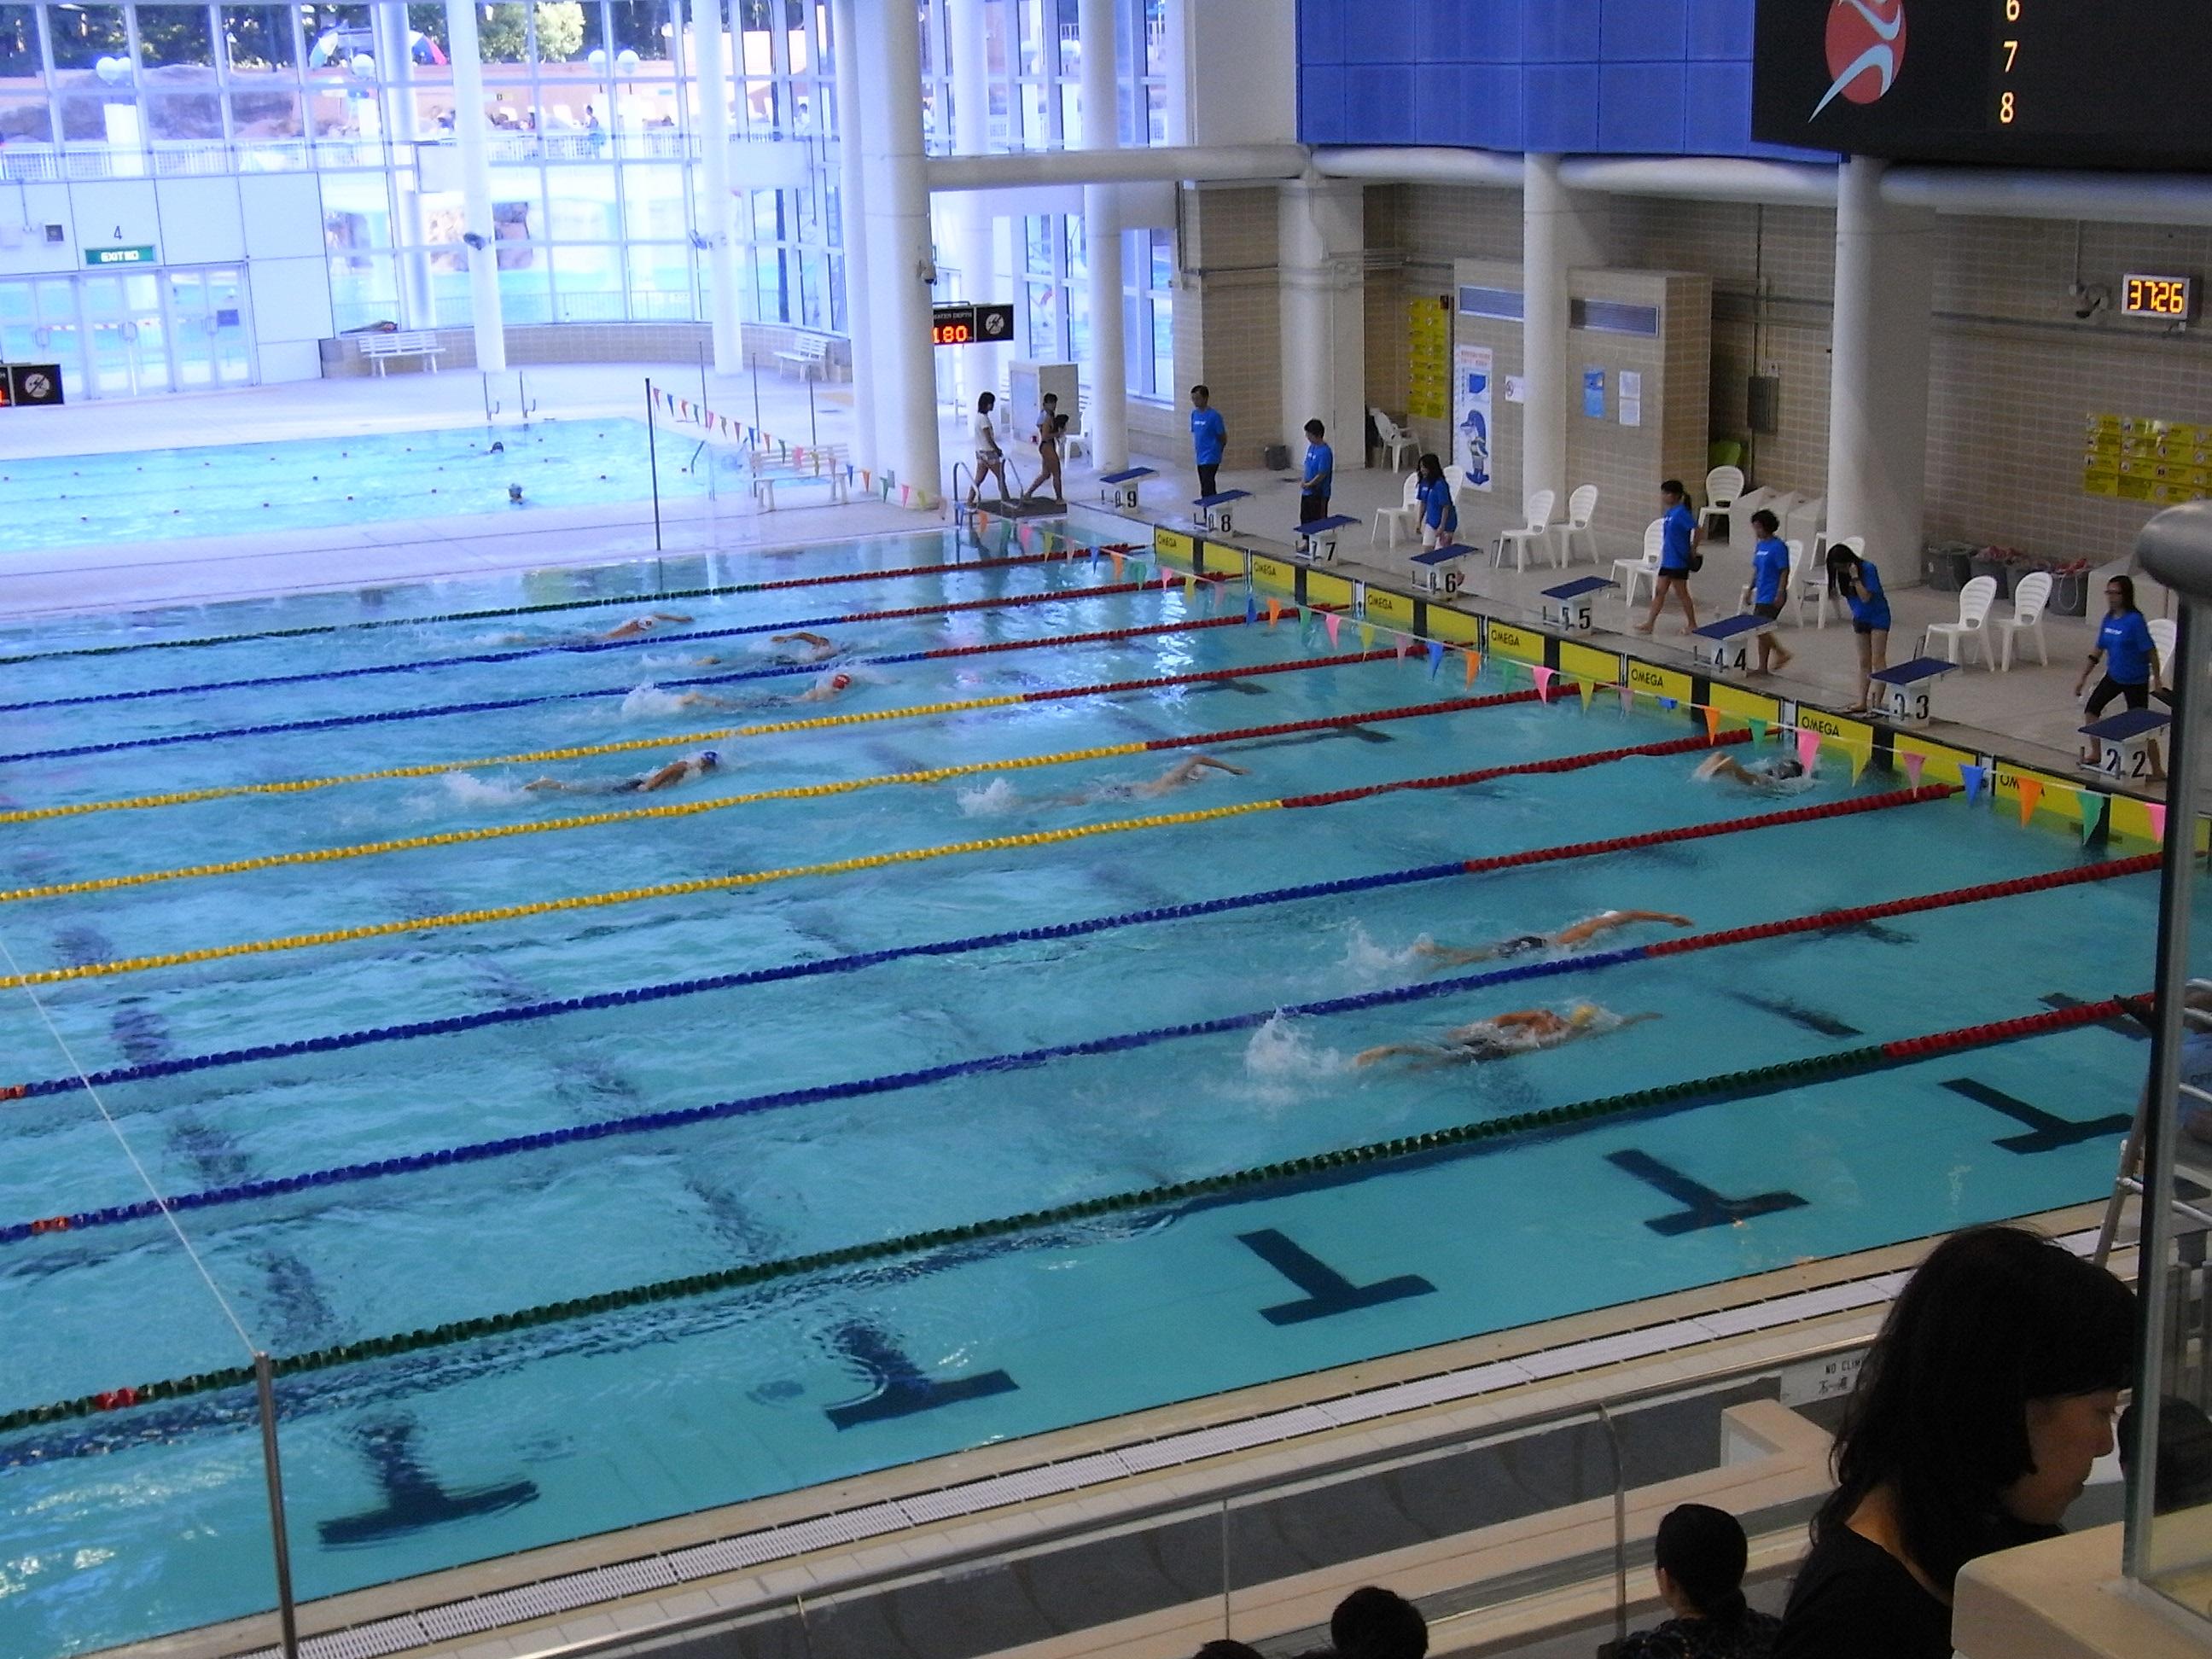 Indoor Public Swimming Pool file:hk tst kln park swimming pool 06 indoor july-2012